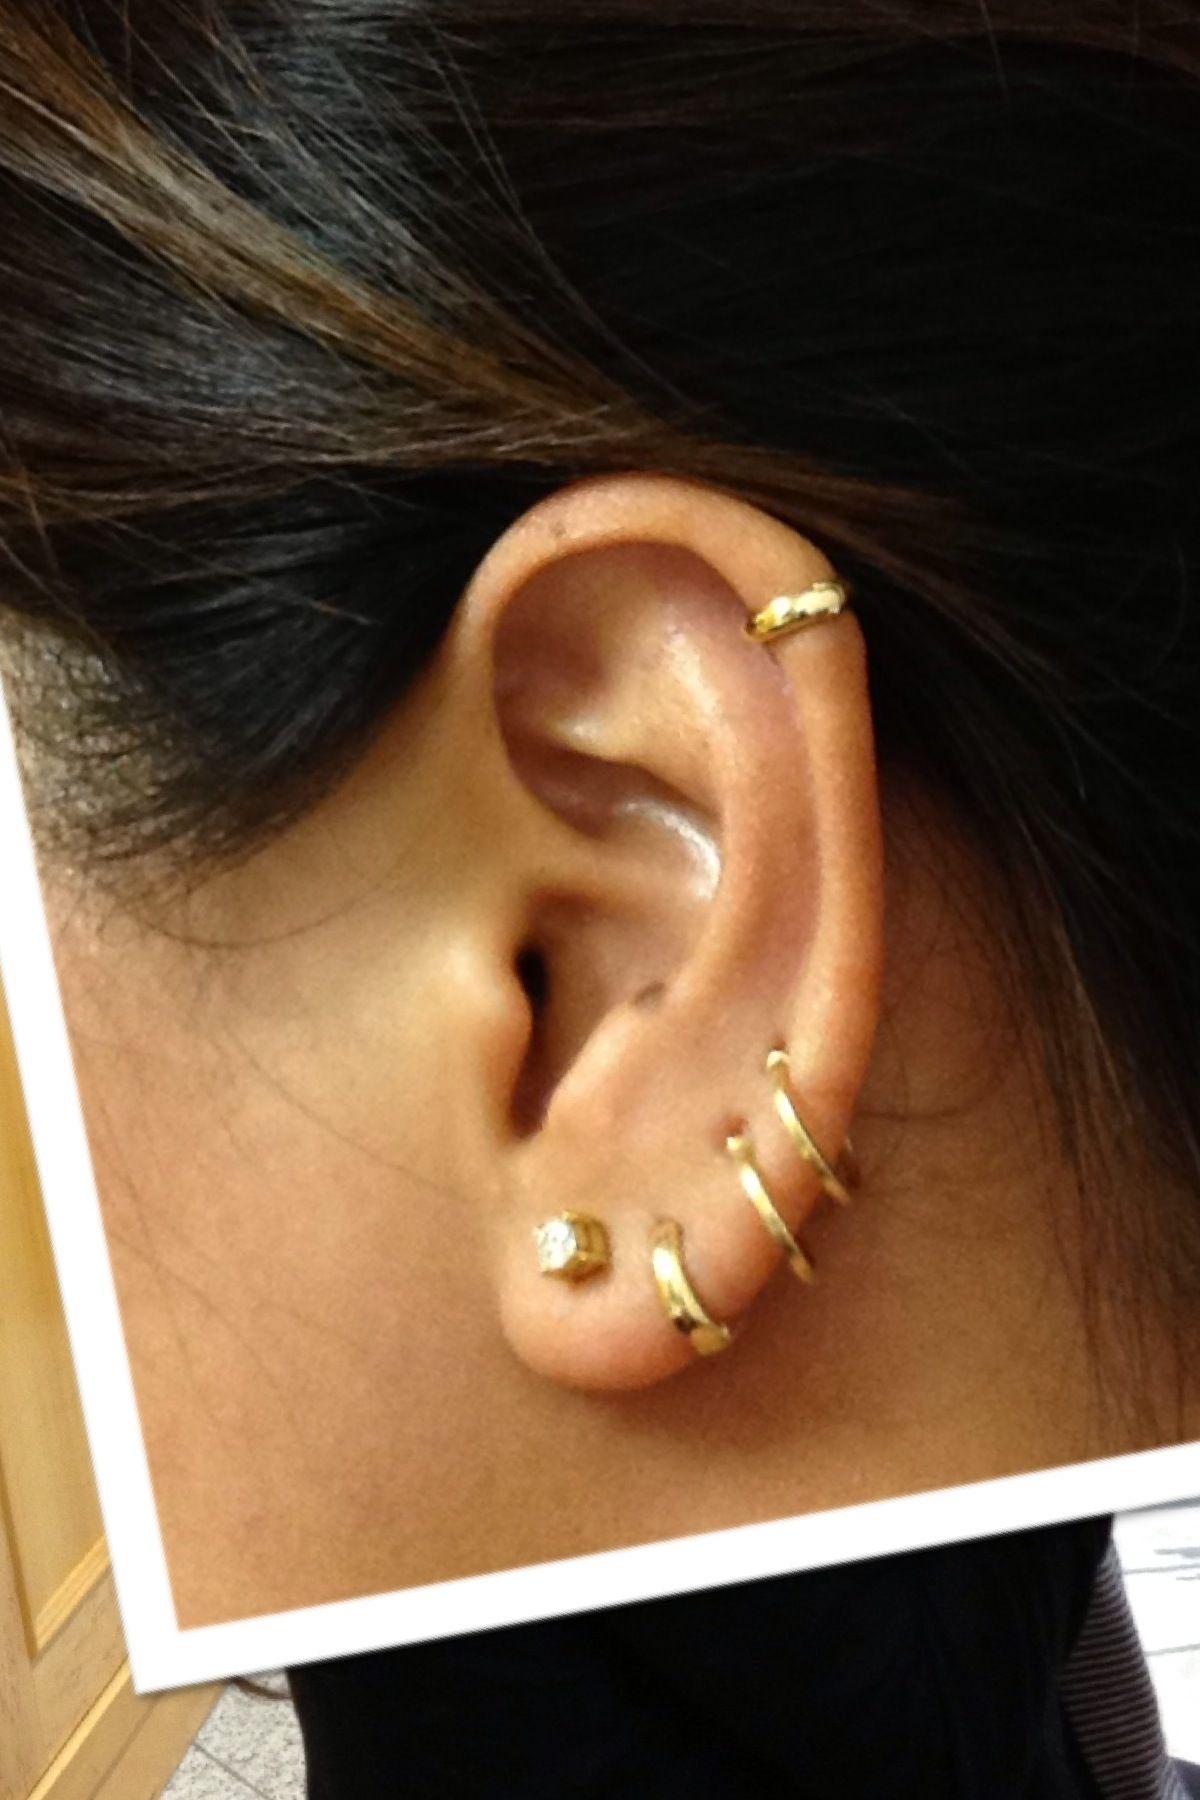 Tragus piercing names  Piercing  ear piercing and tattoo ideas  Pinterest  Piercing